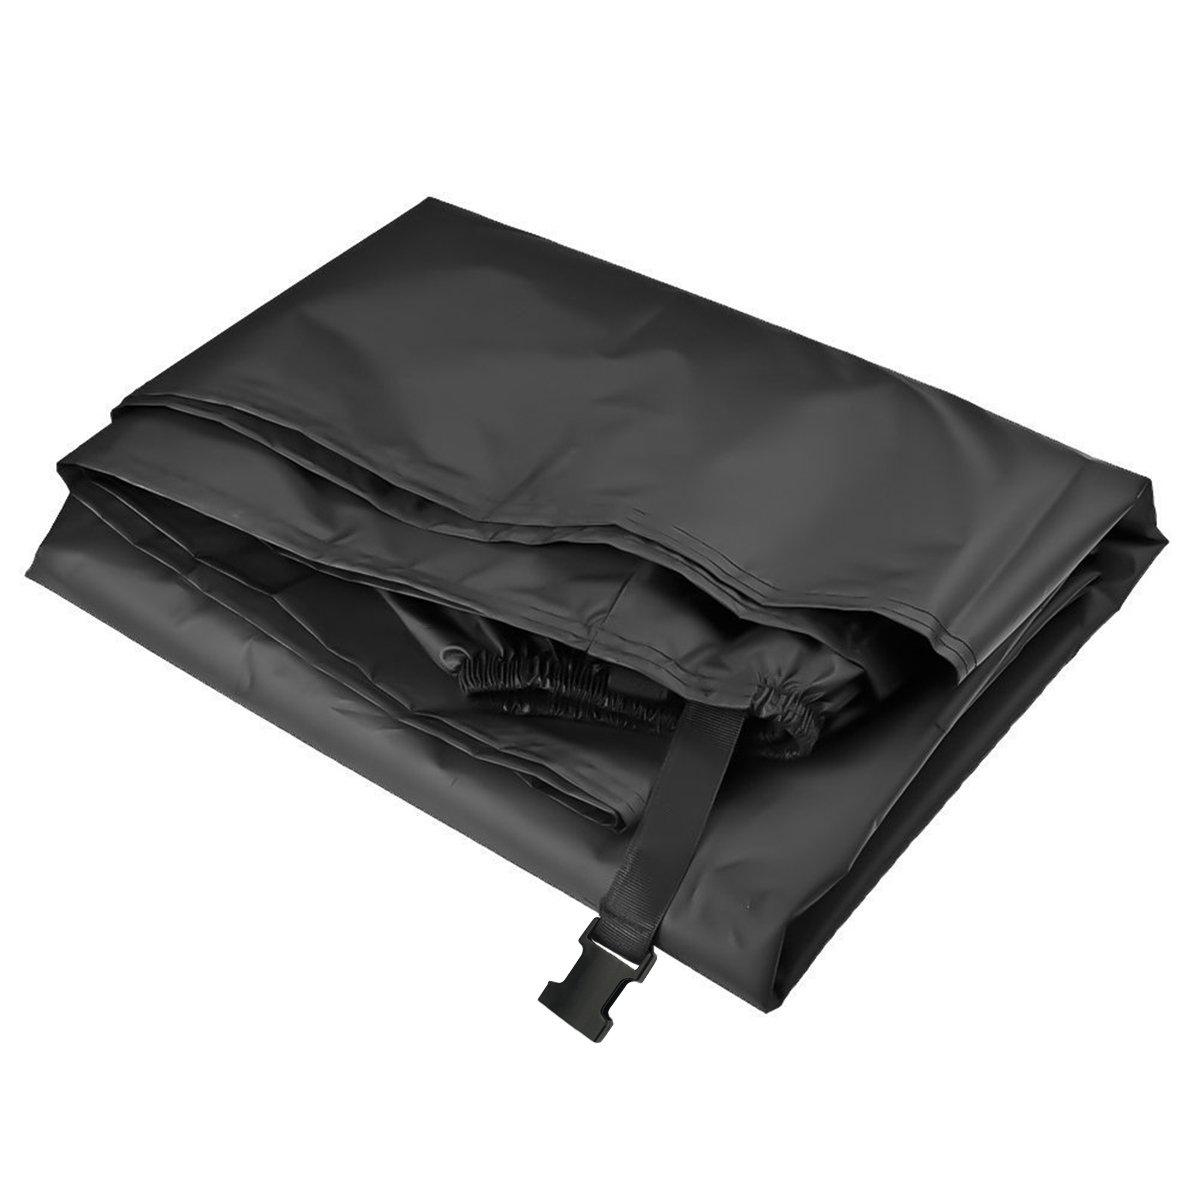 fahrradabdeckung wasserdicht fahrradschutzh lle. Black Bedroom Furniture Sets. Home Design Ideas